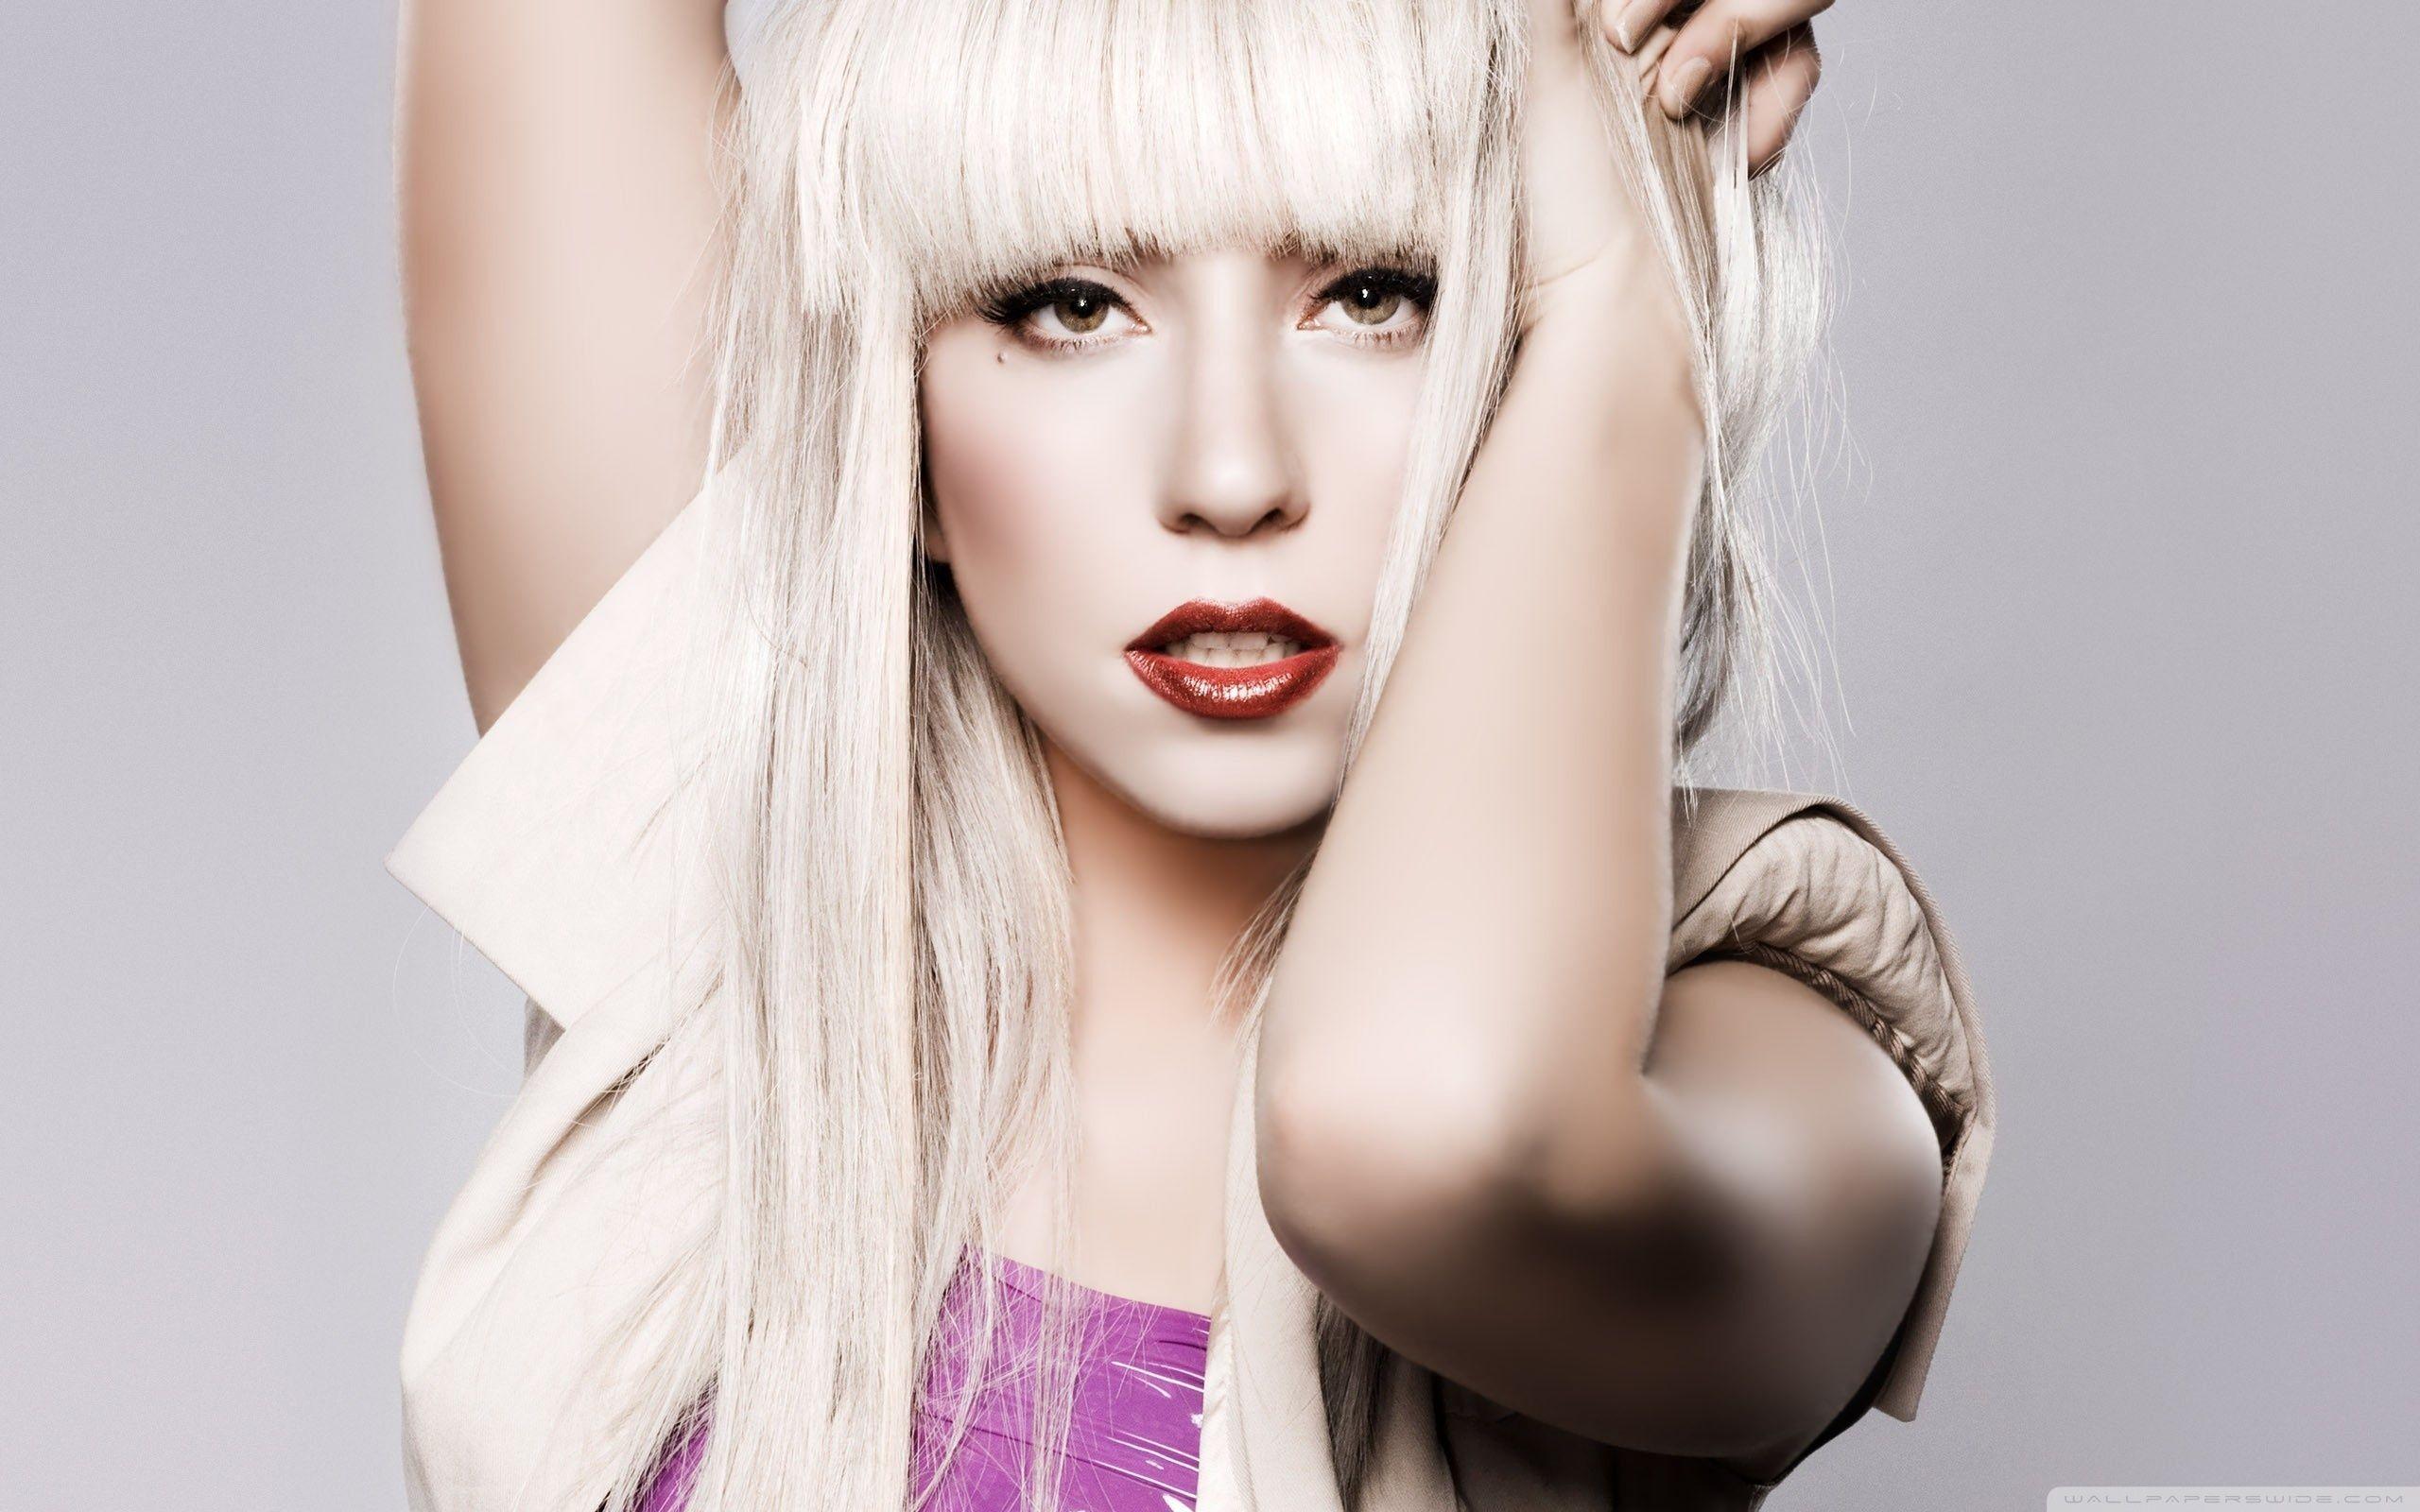 Lady Gaga HD desktop wallpaper Widescreen High Definition